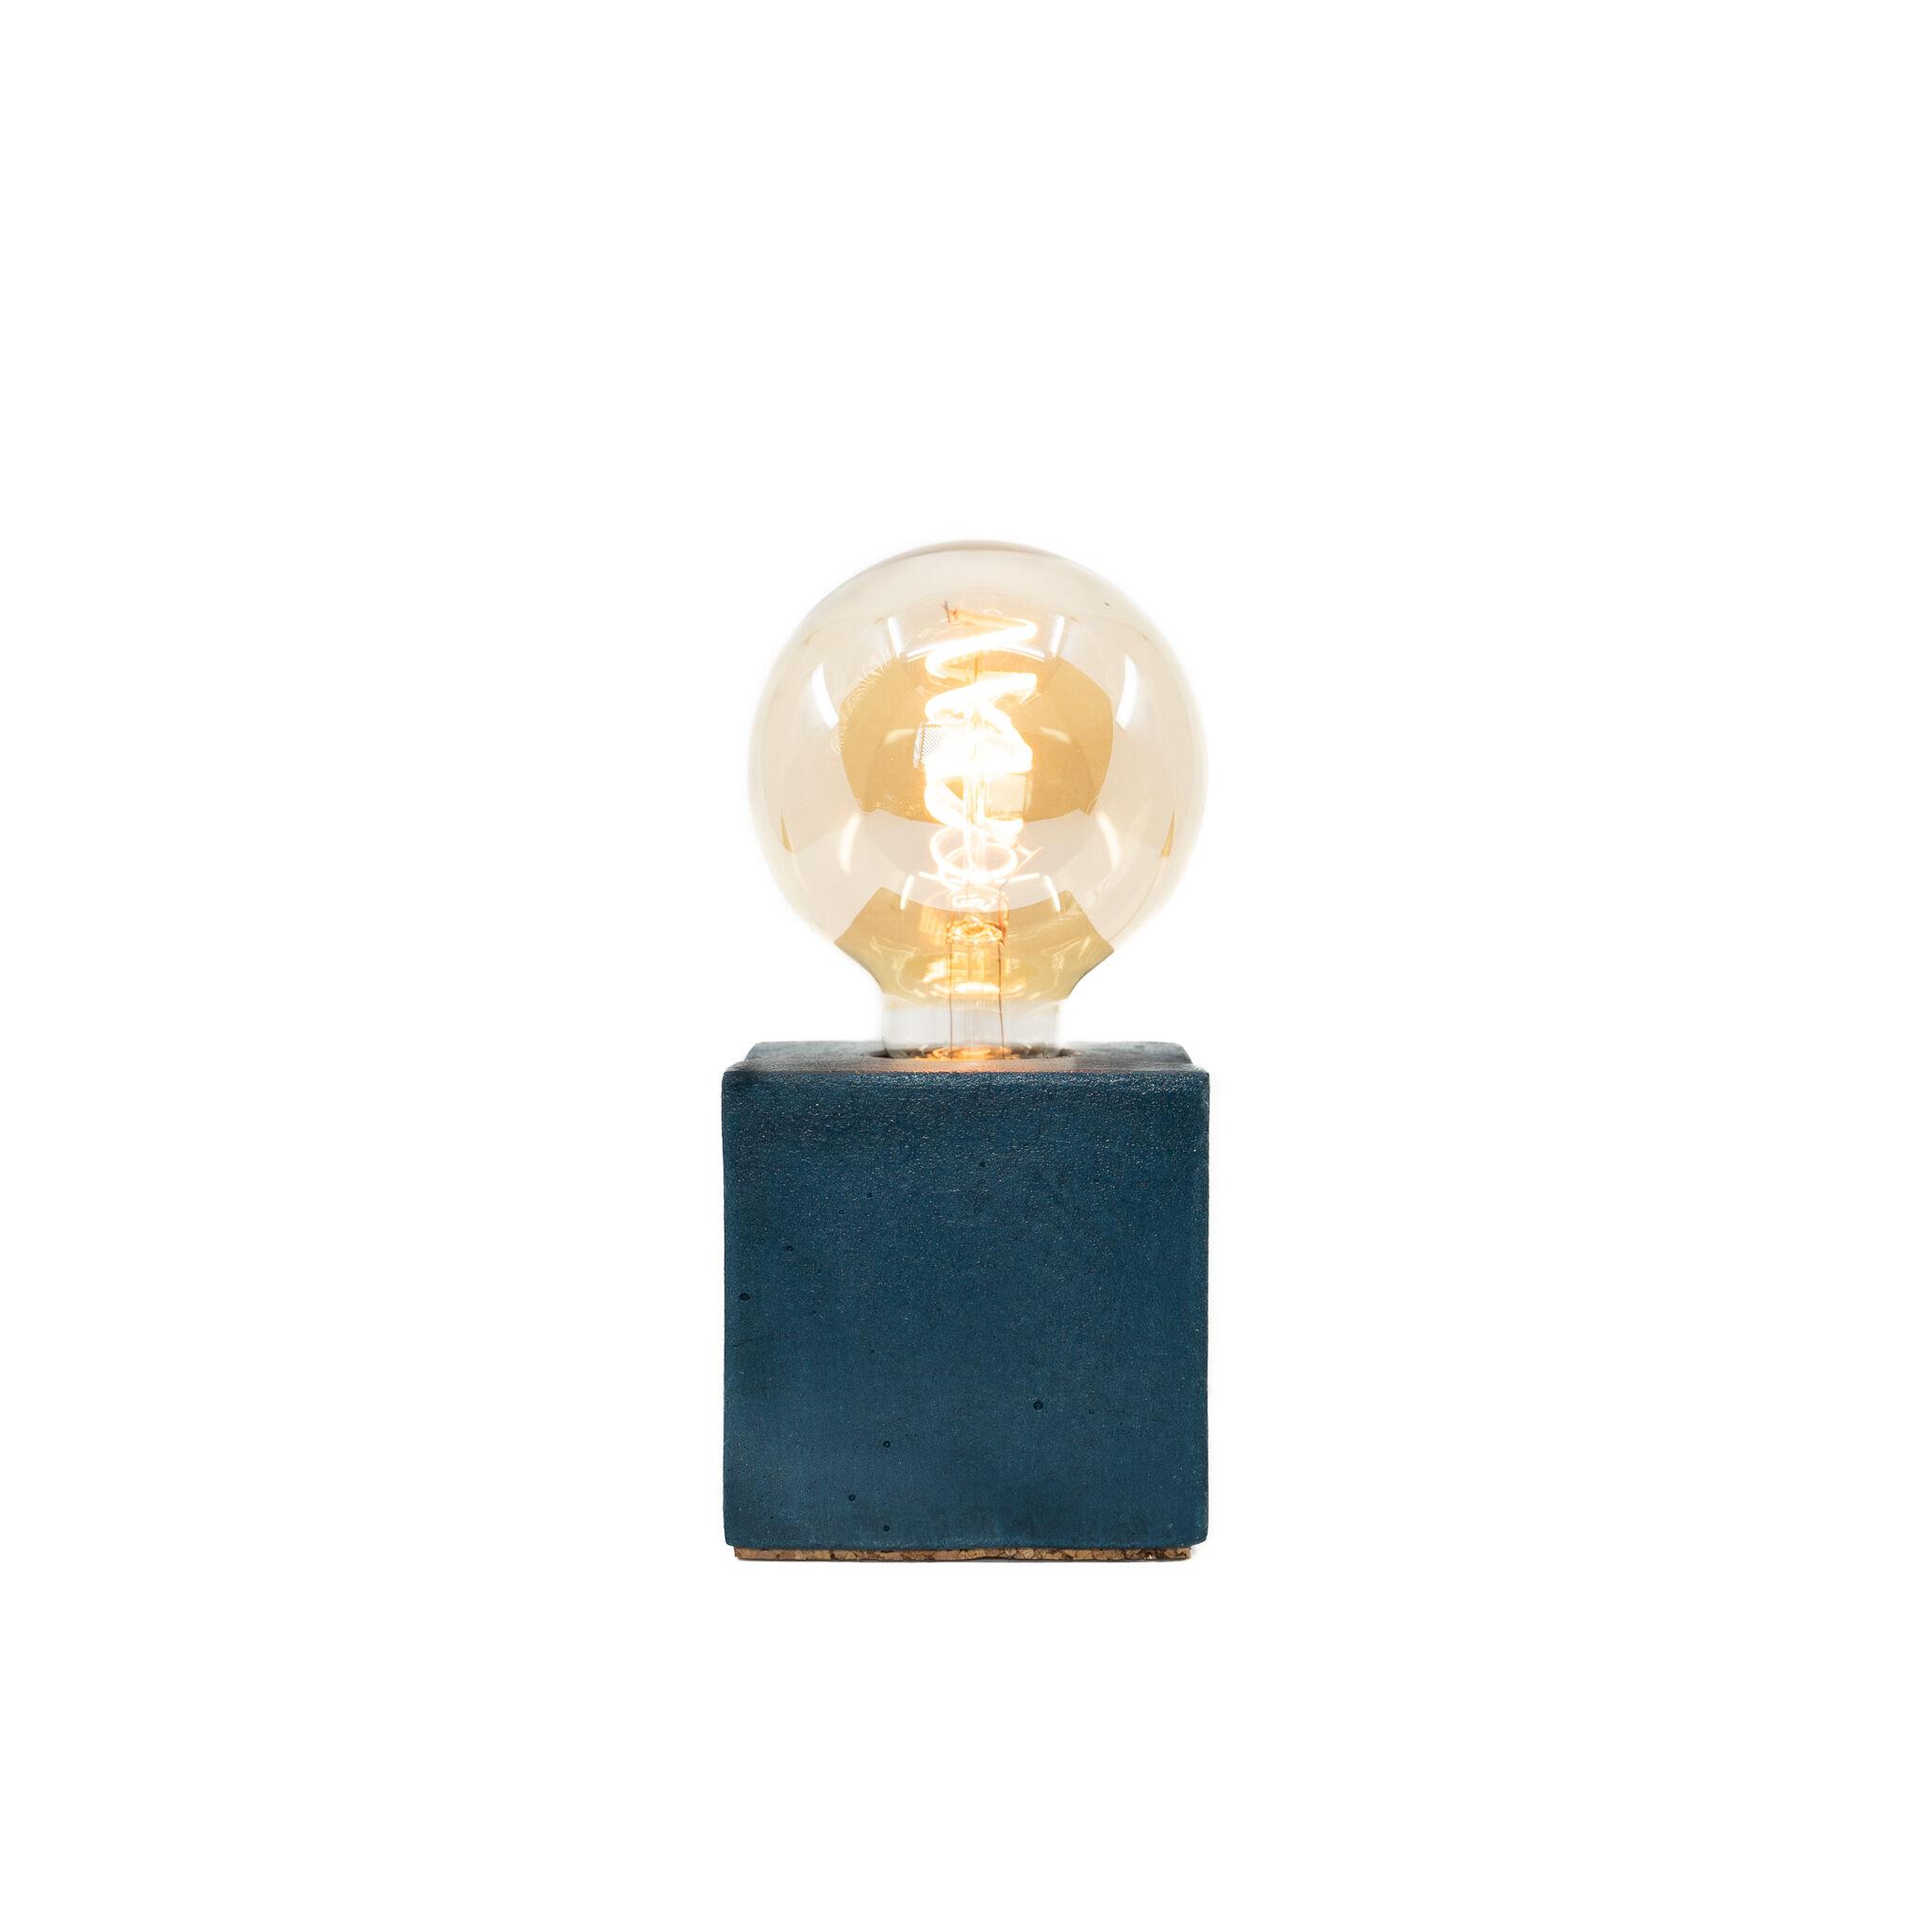 Junny Lampe cube en béton bleu pétrole fabrication artisanale